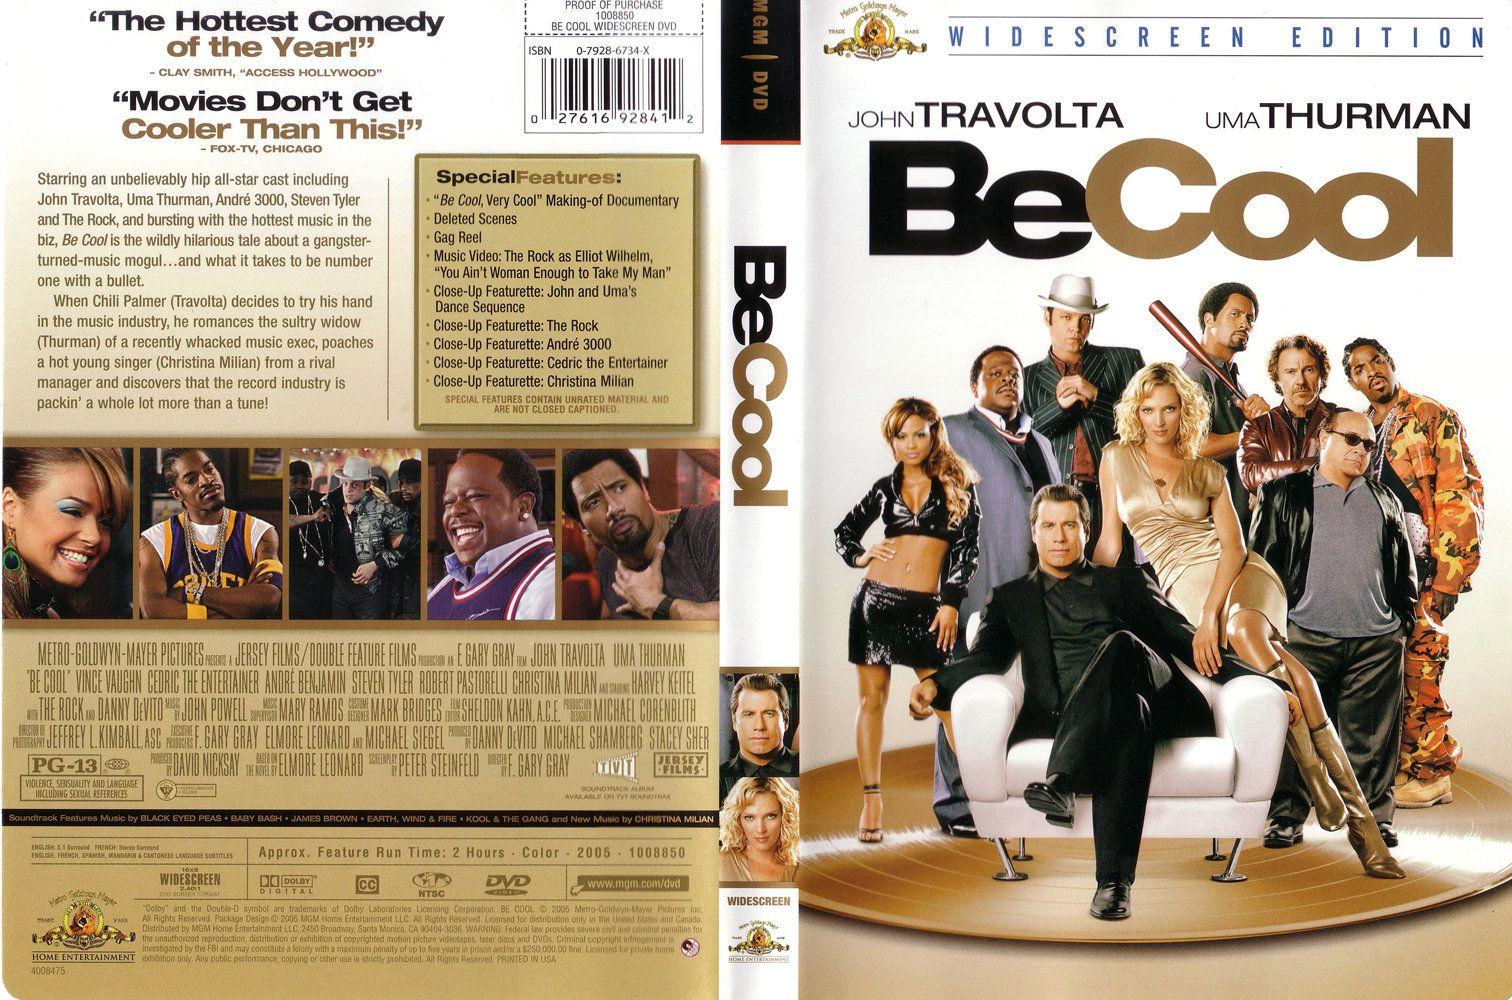 BE COOL | =dRama! dRama! dRama!= | Movie 21, John travolta